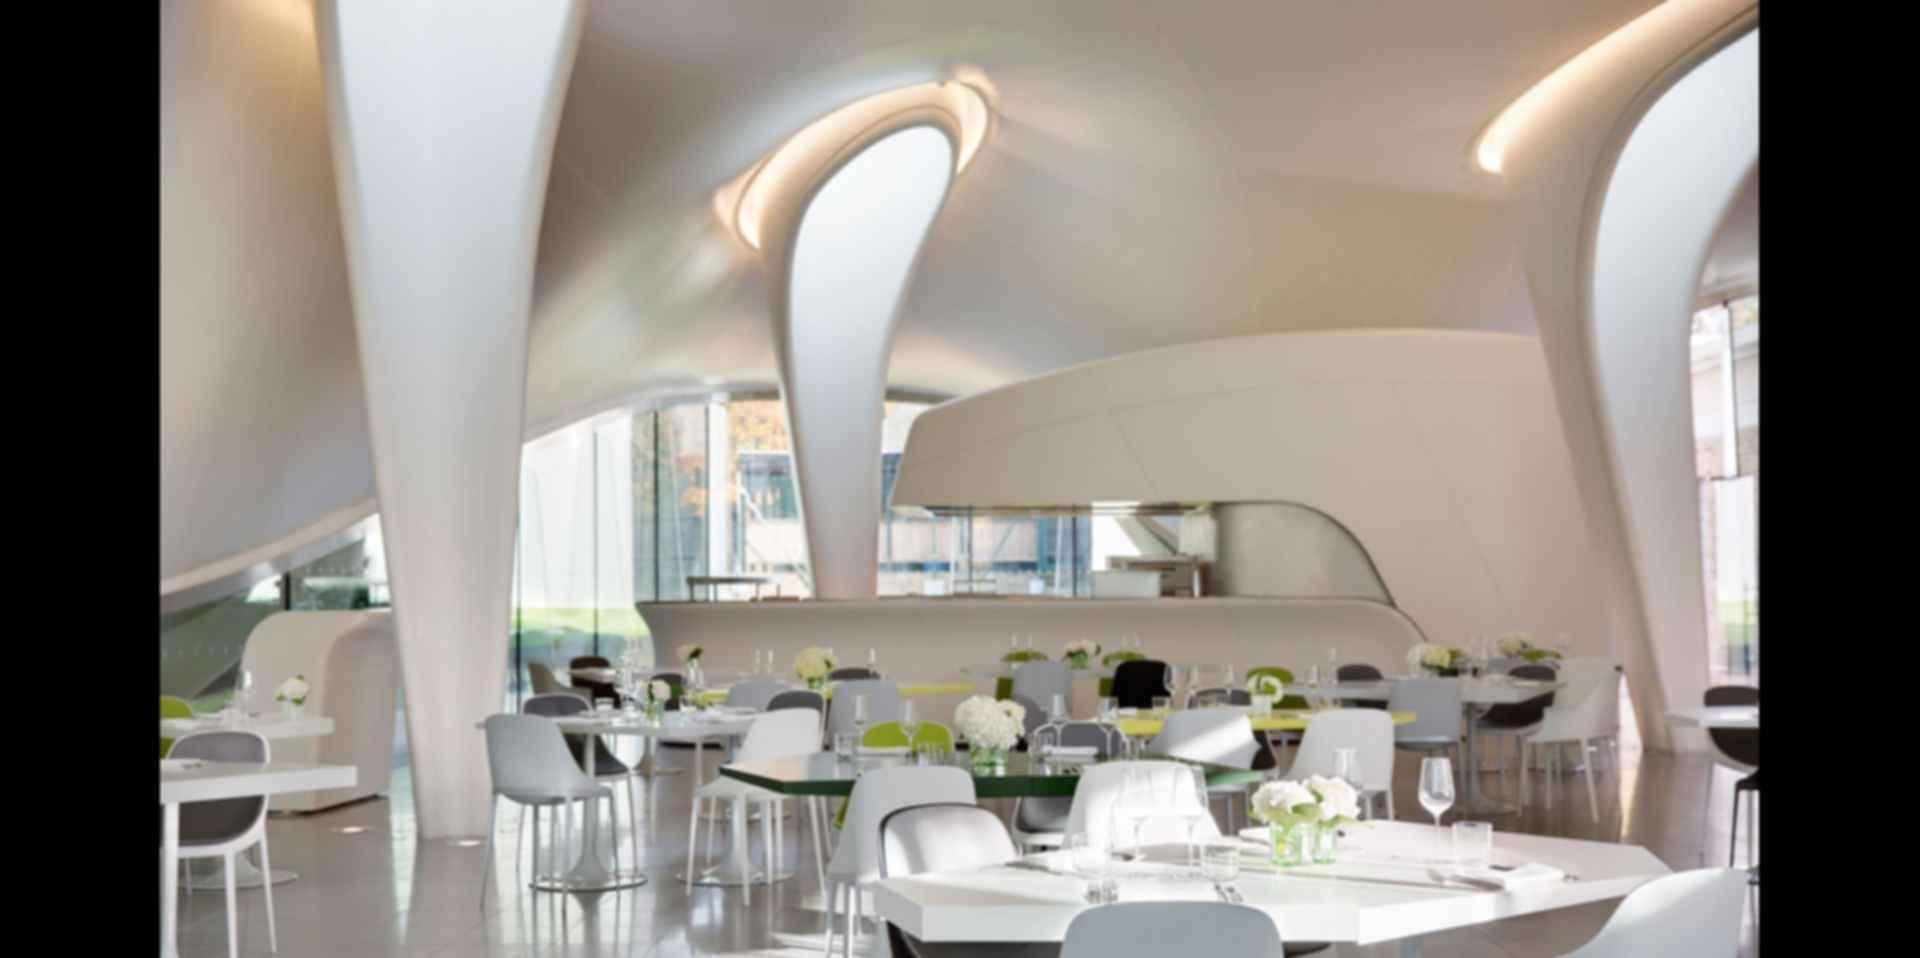 The Serpentine Sackler - Interior/Dining Area